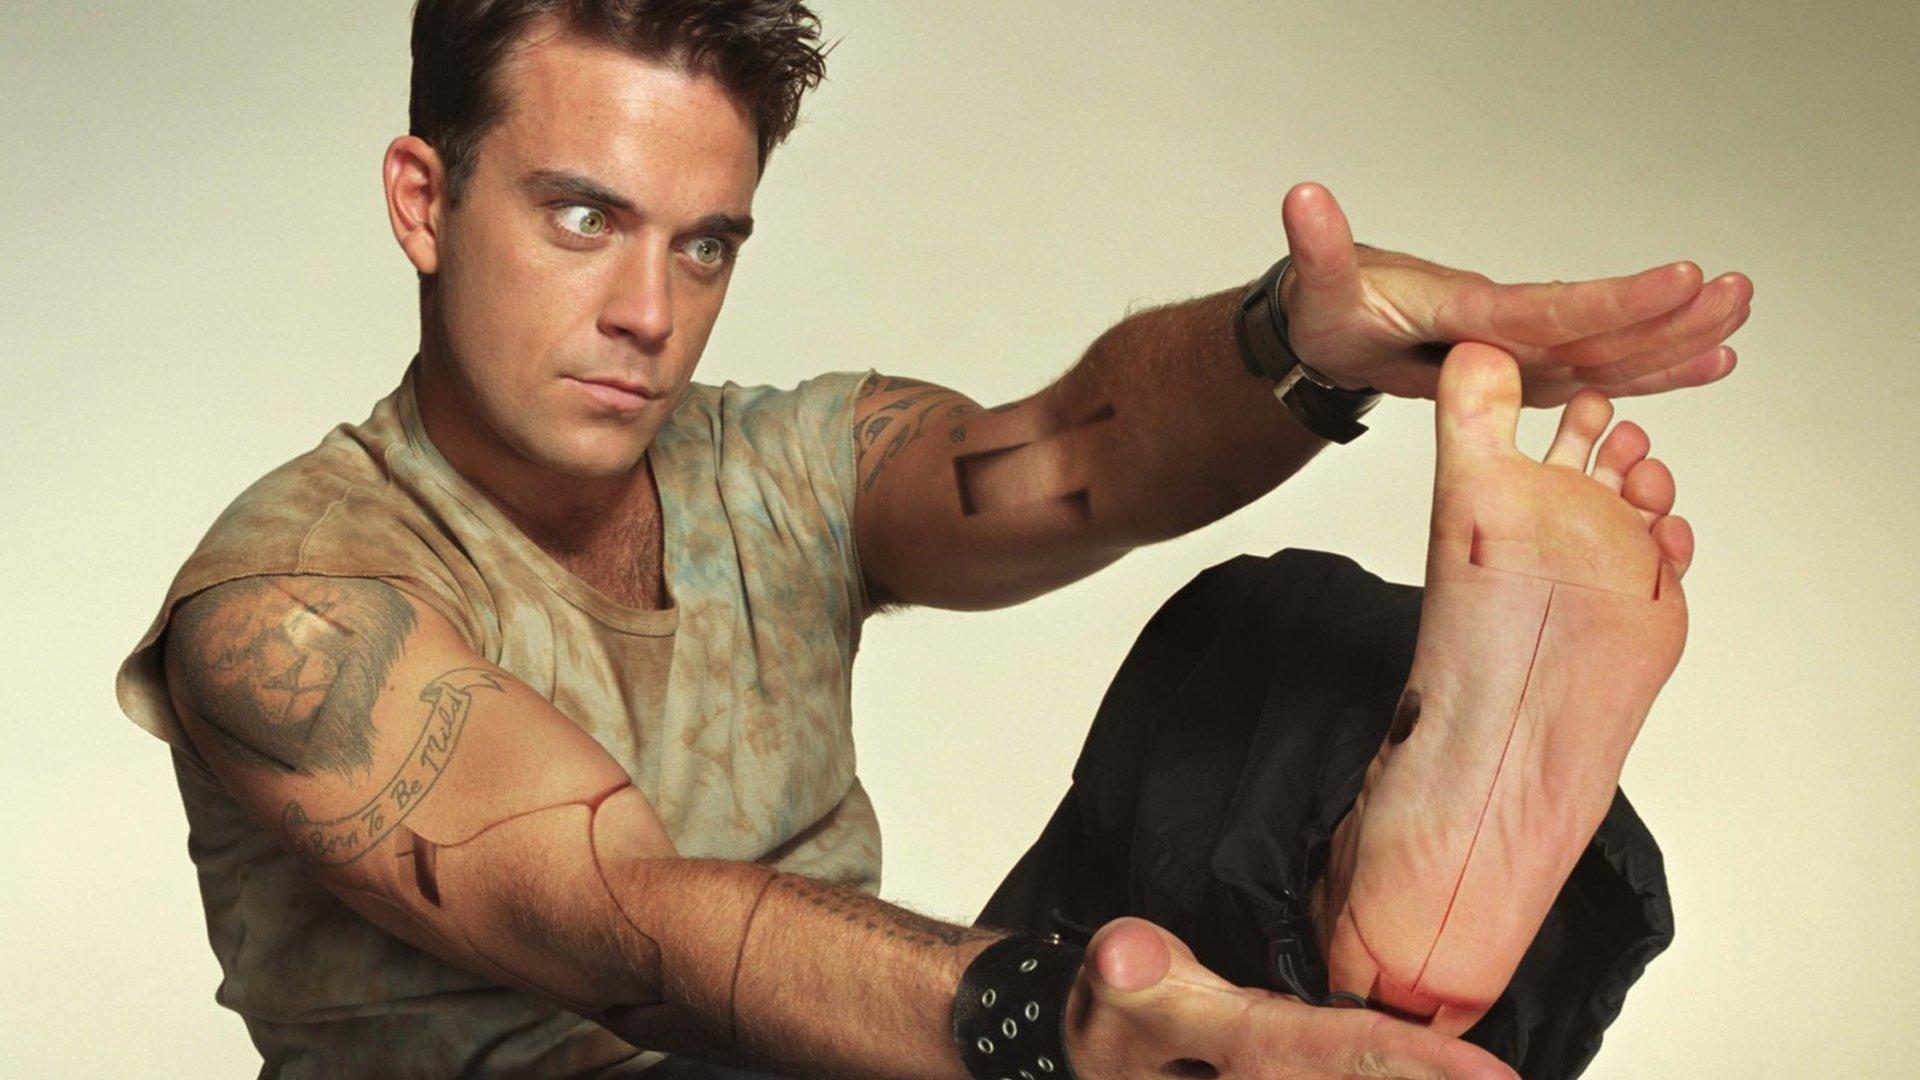 Happy Birthday Robbie Williams Robbie Williams - Better Man (Unplugged)   vía